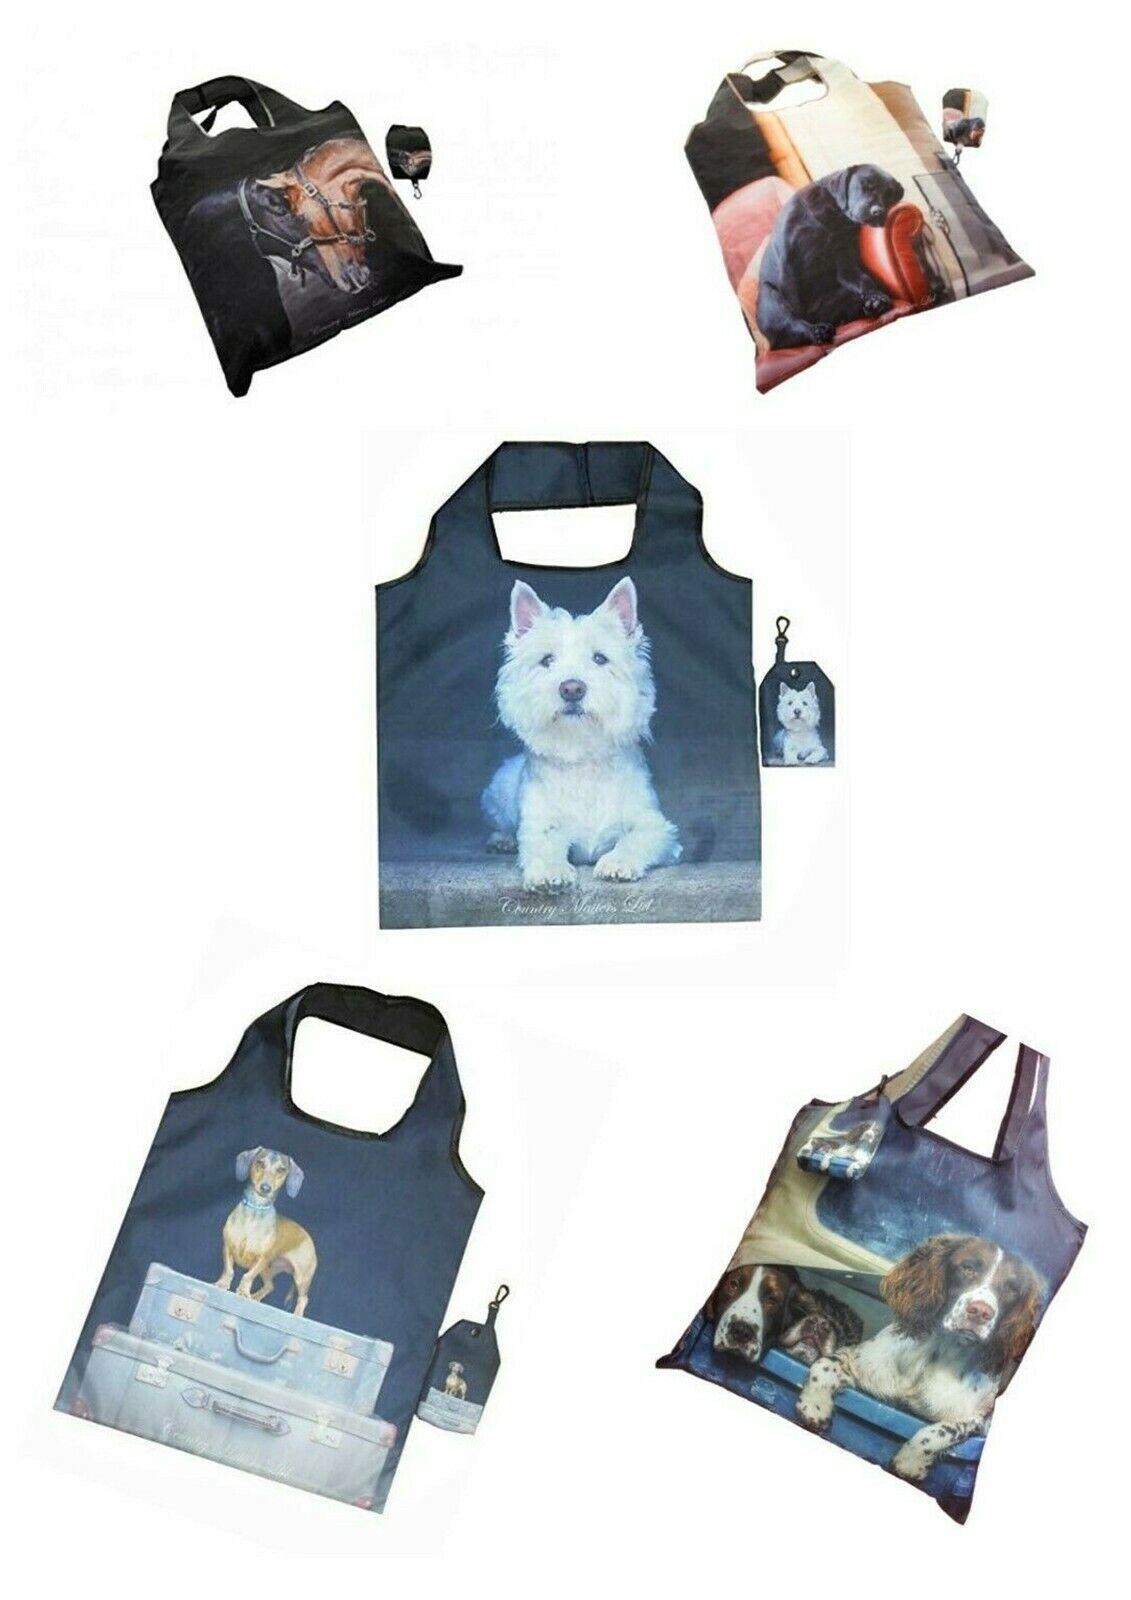 Image 01 - Country-Matters-Shopping-bag-Fold-Up-Bag-Fold-Away-Bag-Clip-Bag-Tote-Bag